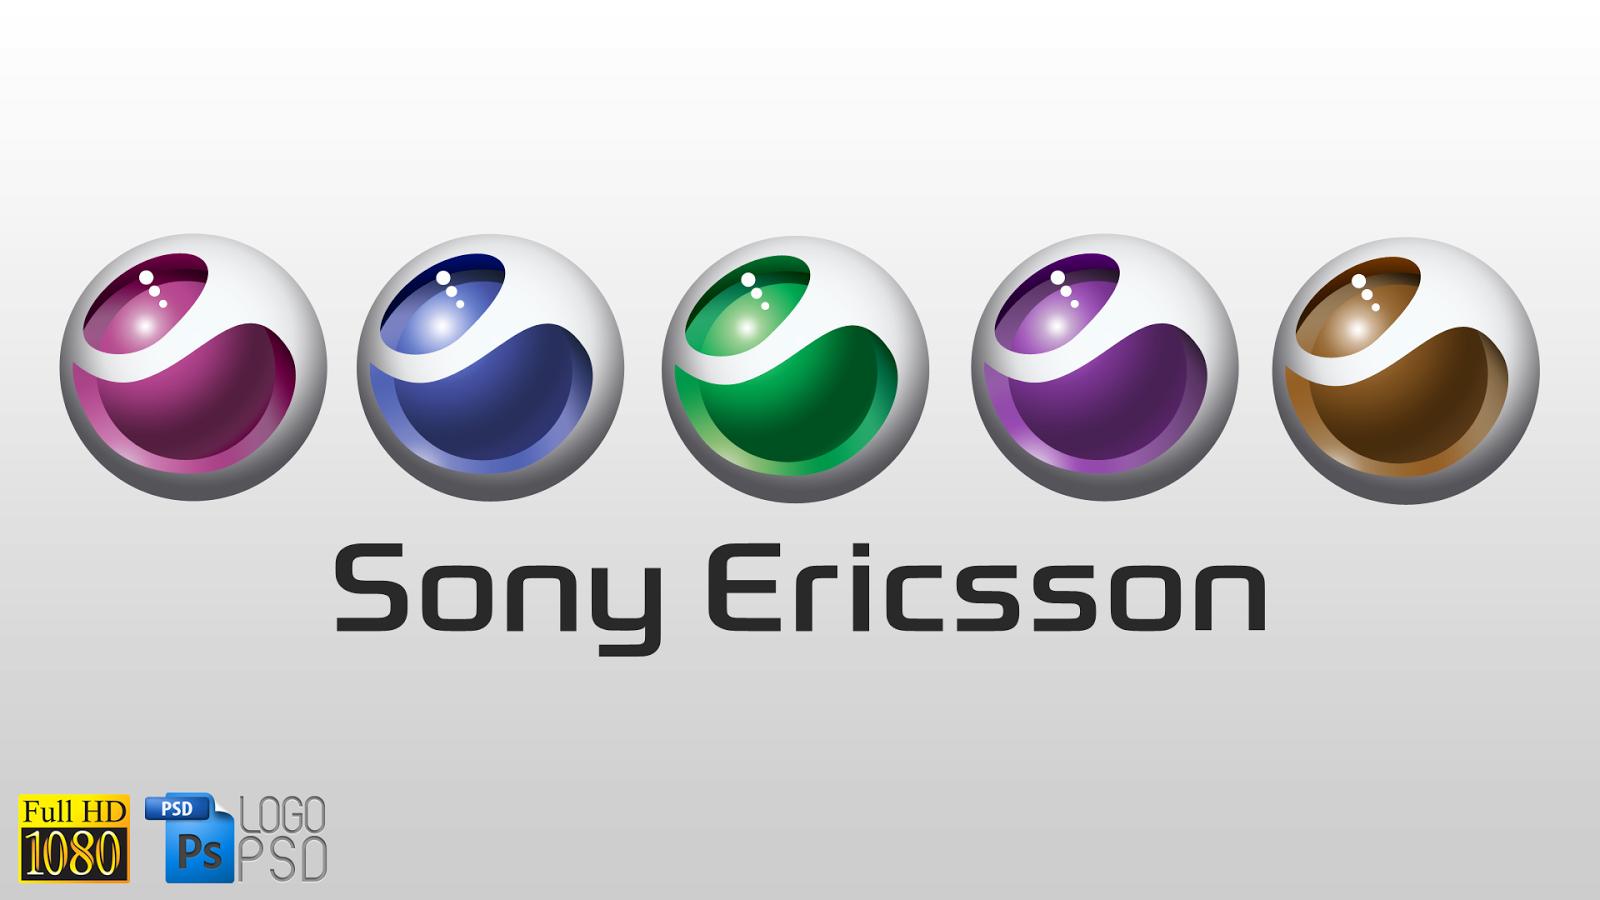 All About Logo: Sony Ericsson Logo